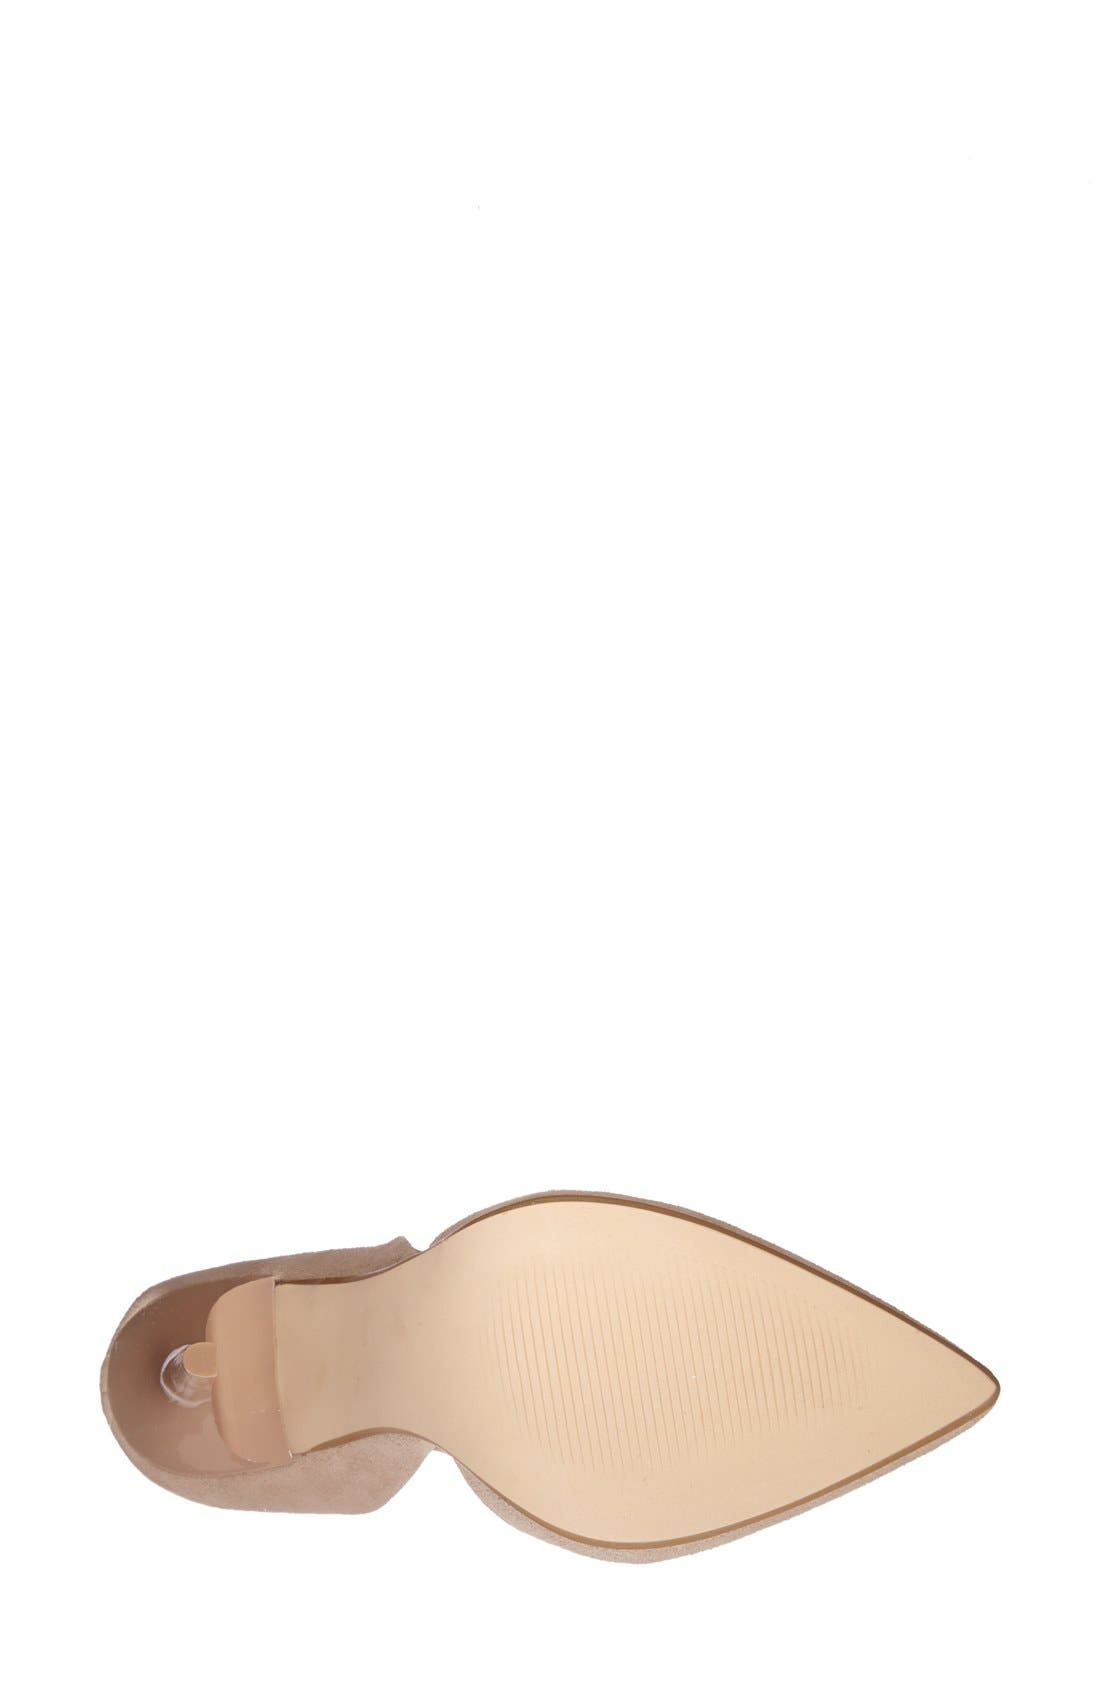 Alternate Image 4  - Steve Madden 'Varcityy' Pointy Toe Pump (Women)